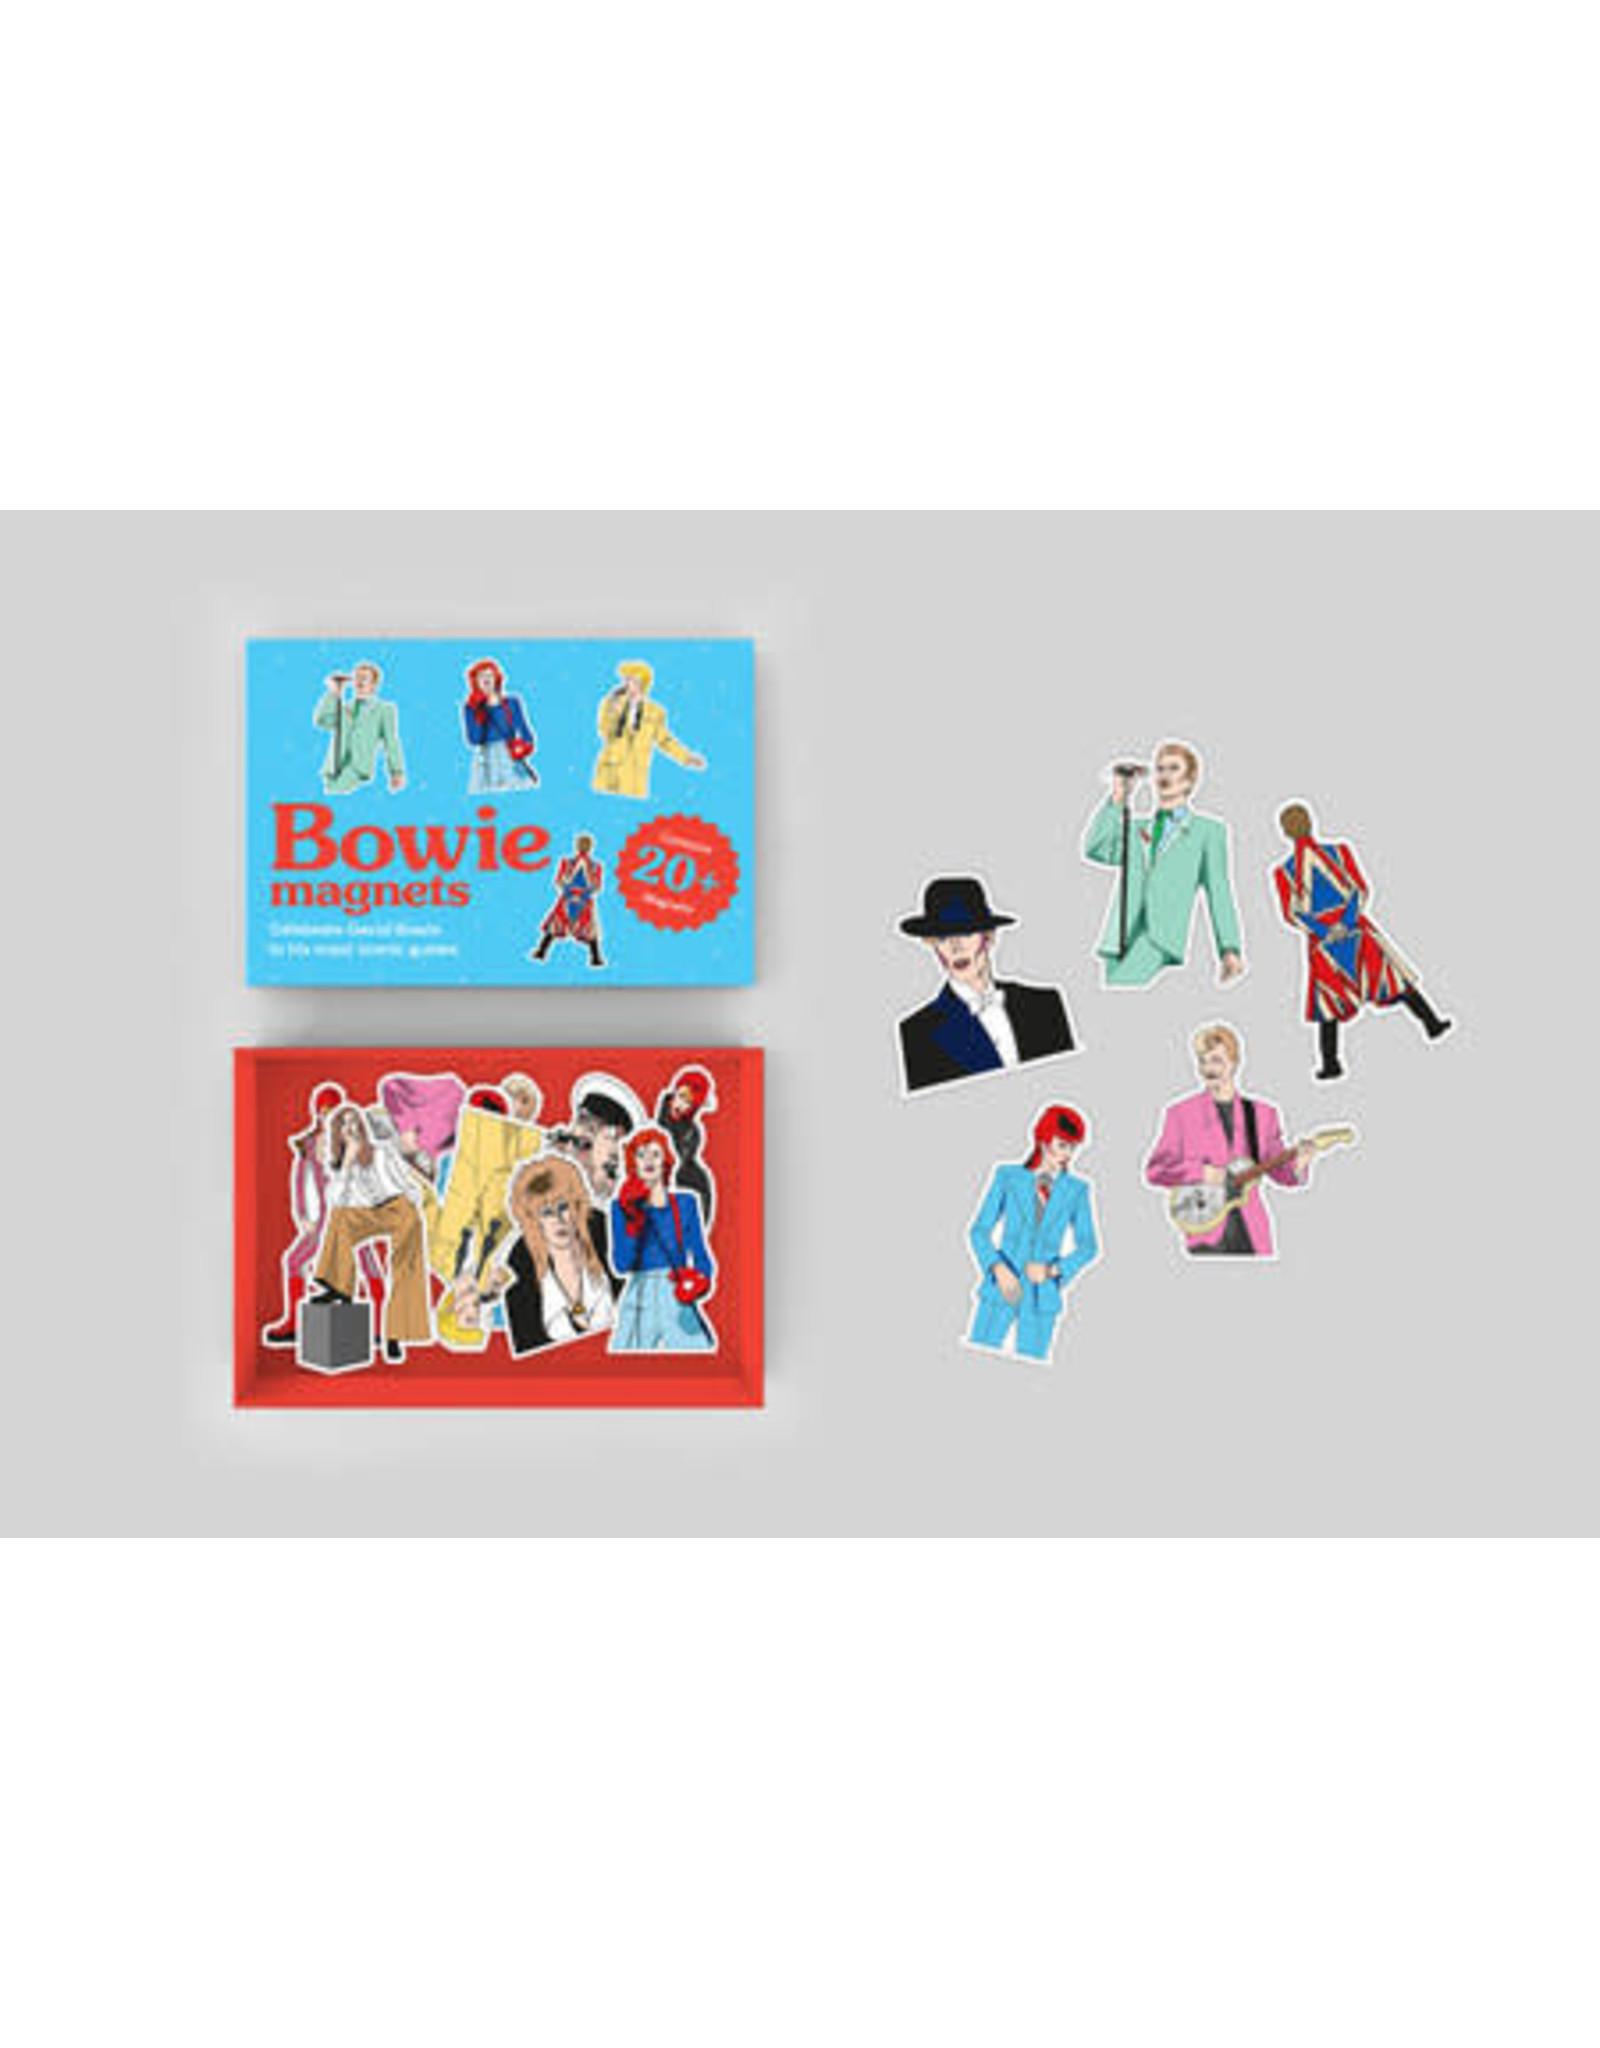 PRH - Bowie Magnets